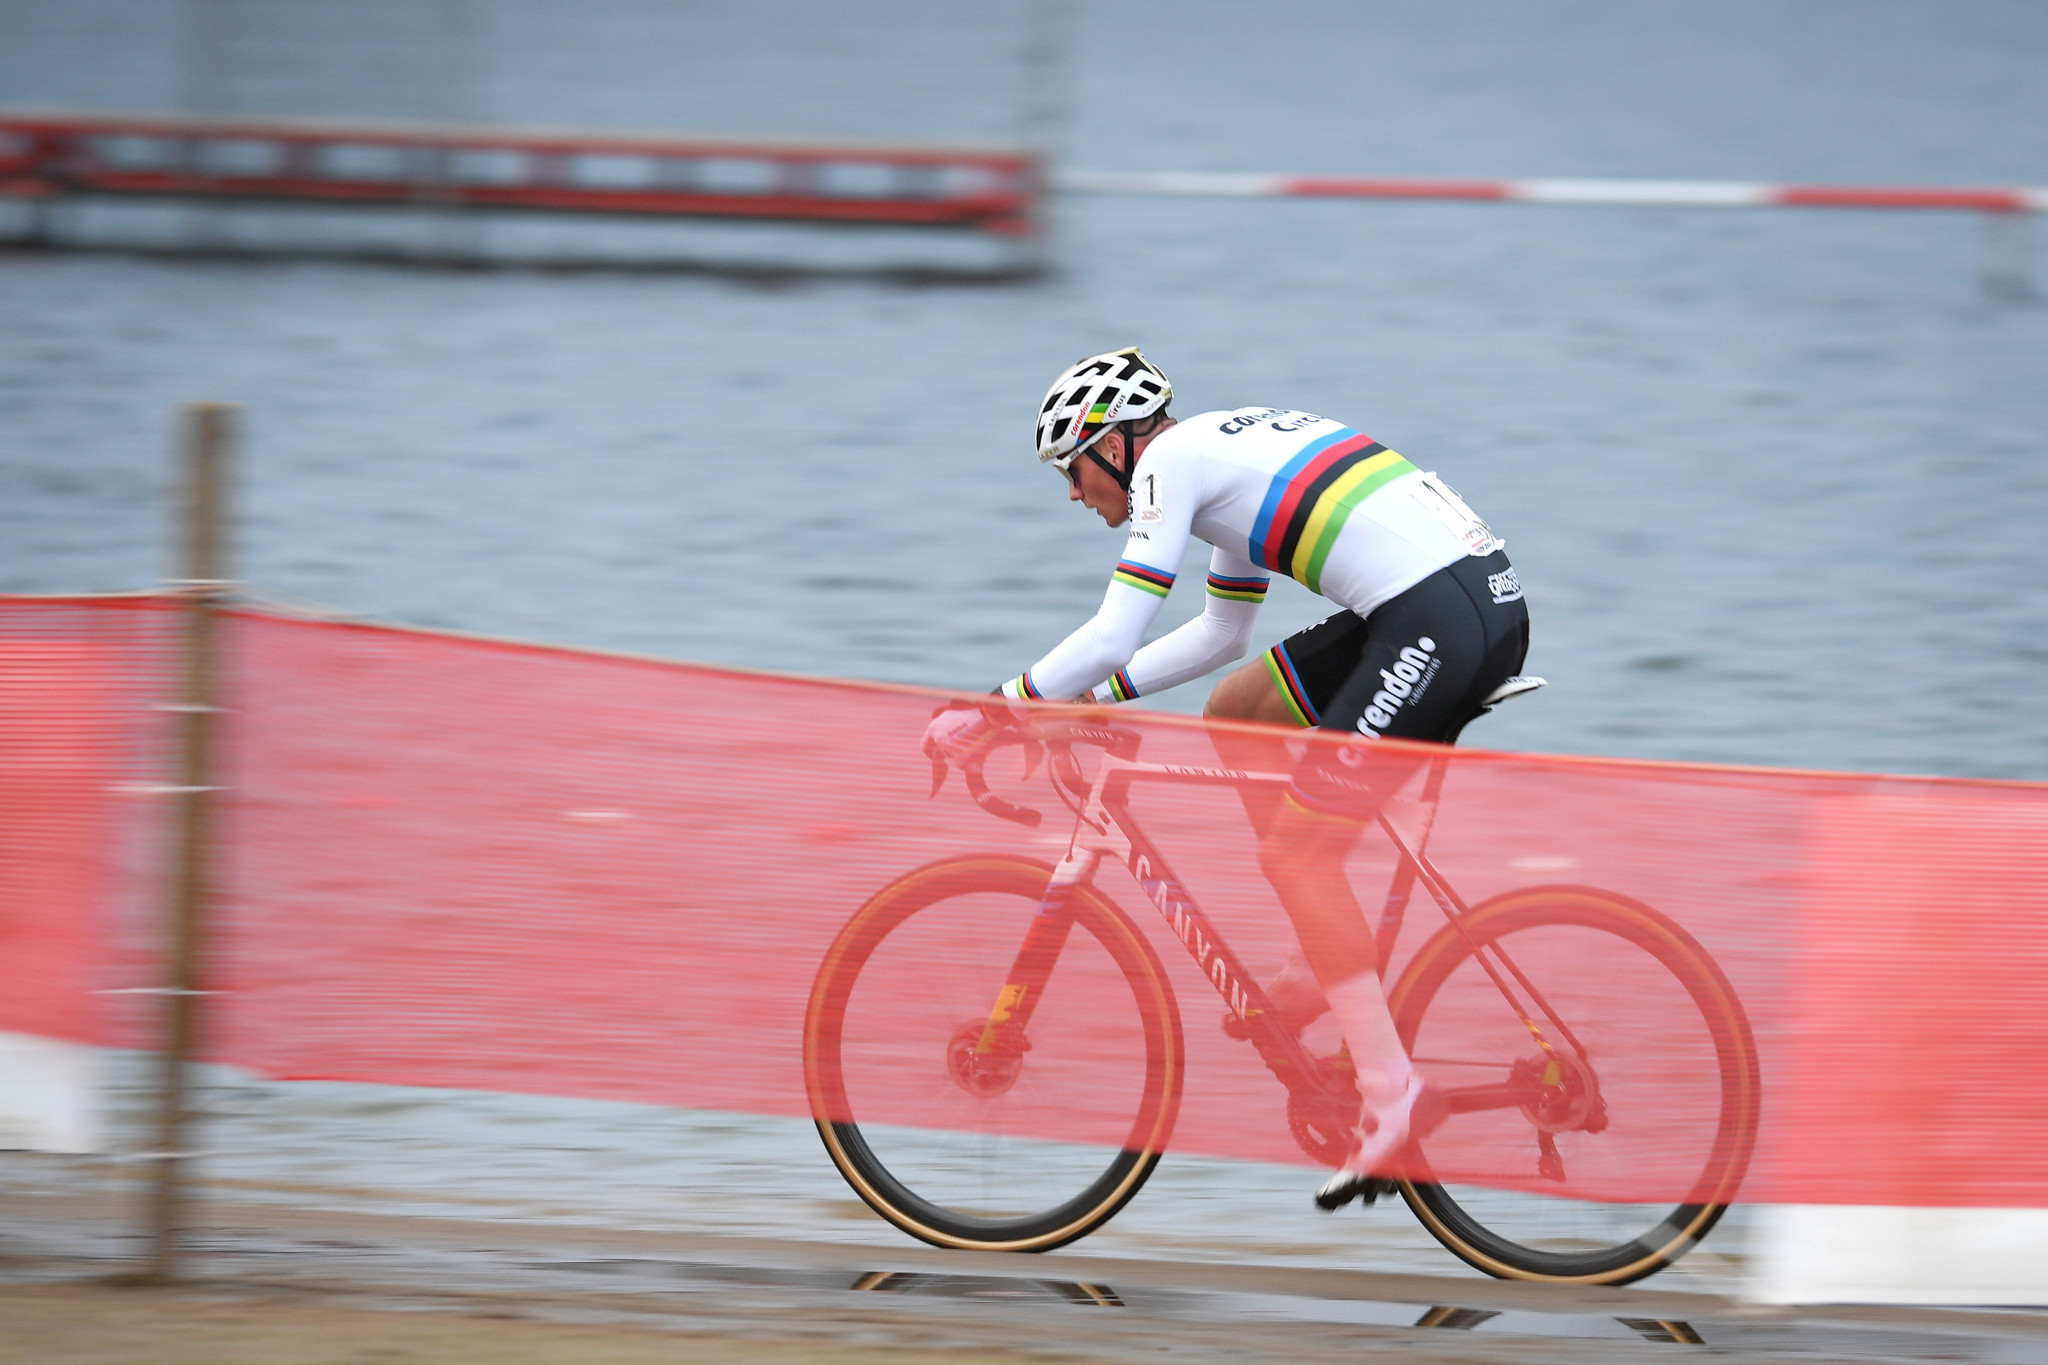 Van der Poel seeking to extend UCI Cyclo-cross World Cup win streak in Namur